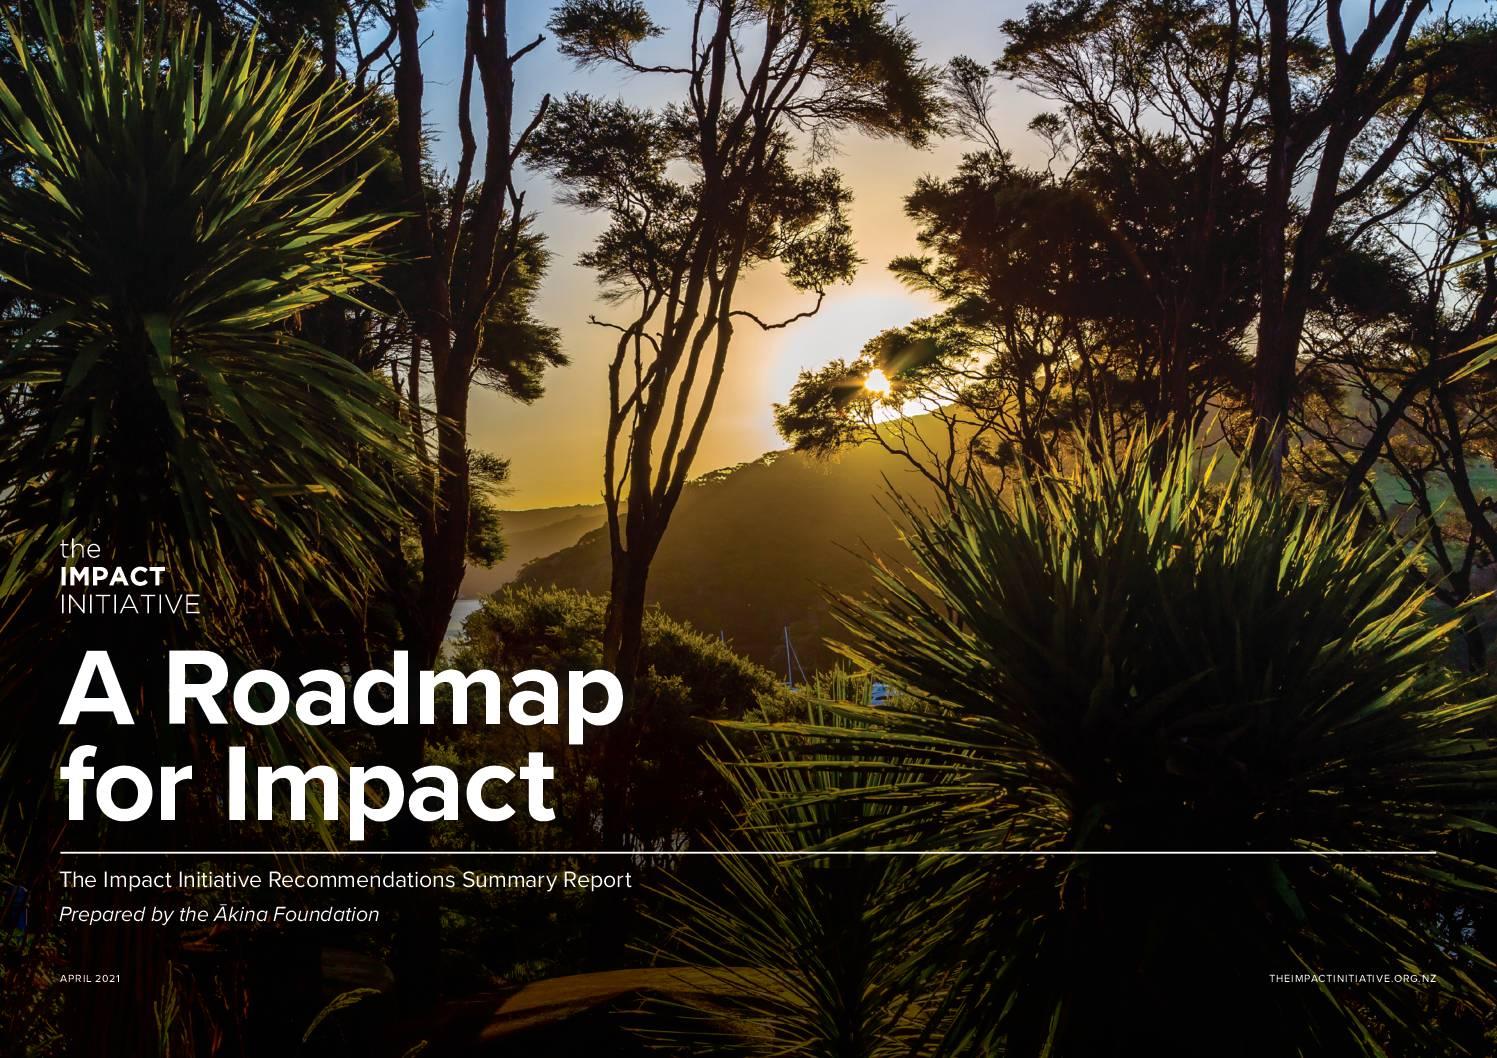 Roadmap for Impact